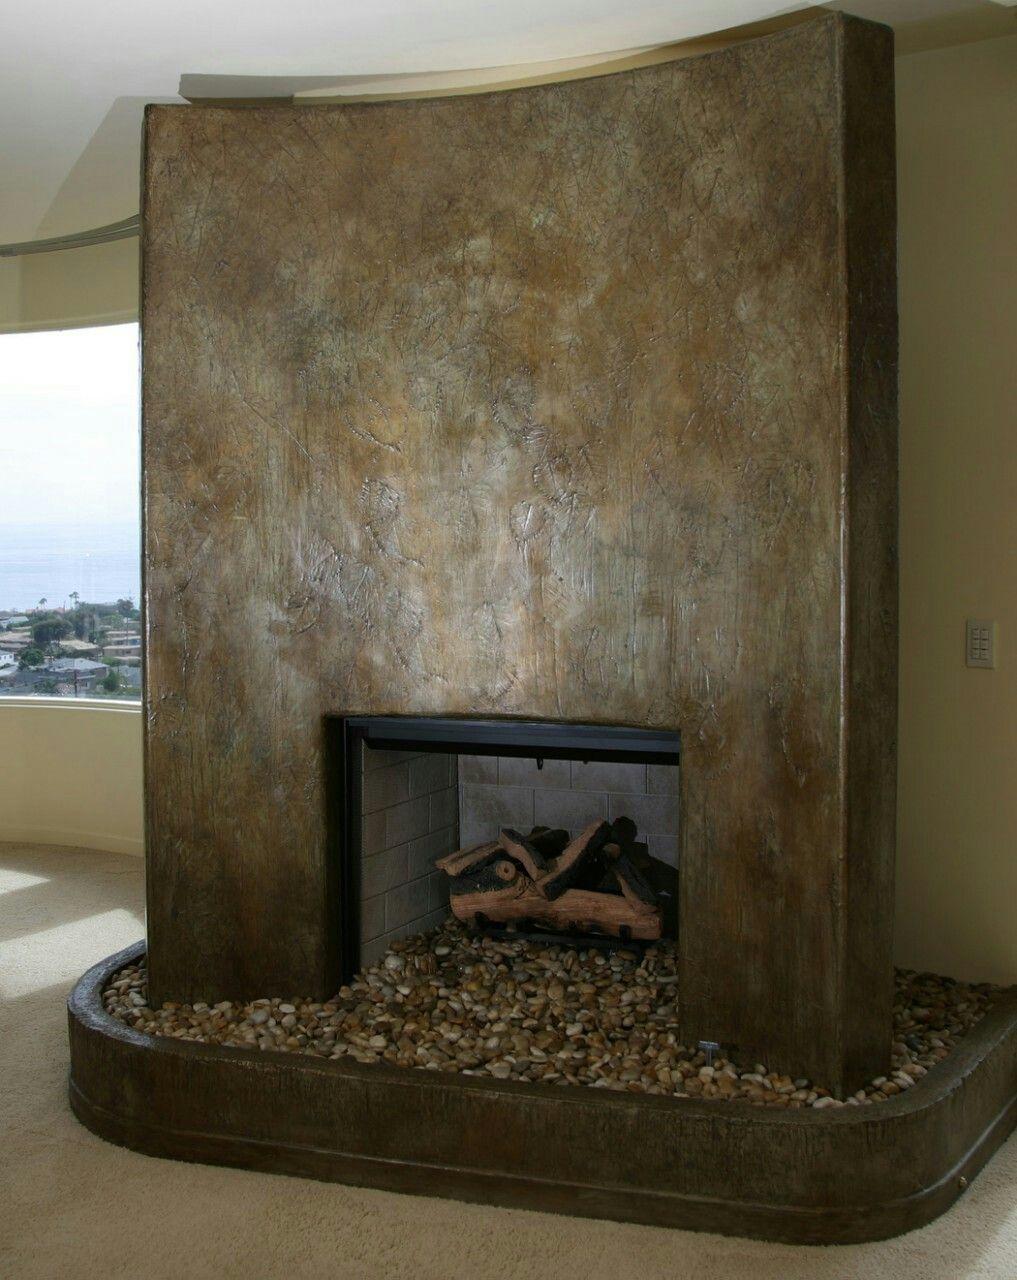 Wien, Stucco Wände, Stucco Kamin, Kamine, Wandbeschichtungen, Home Design,  House Ideas, Farbe, Dekorative Gemälde